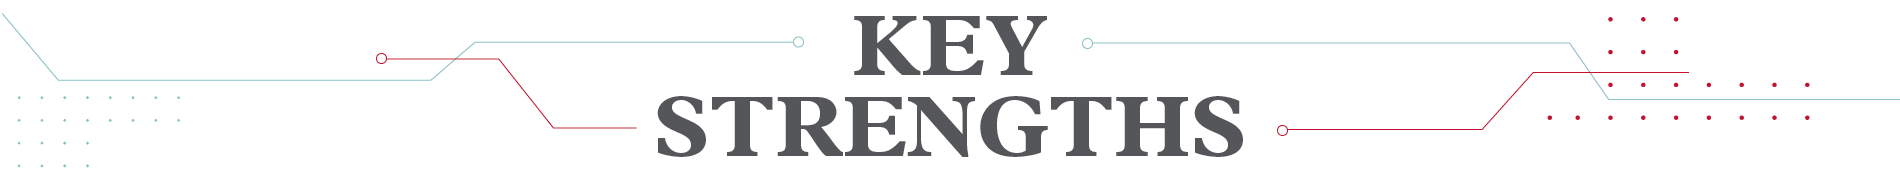 Fintech at Cornell Heading: Key Strengths